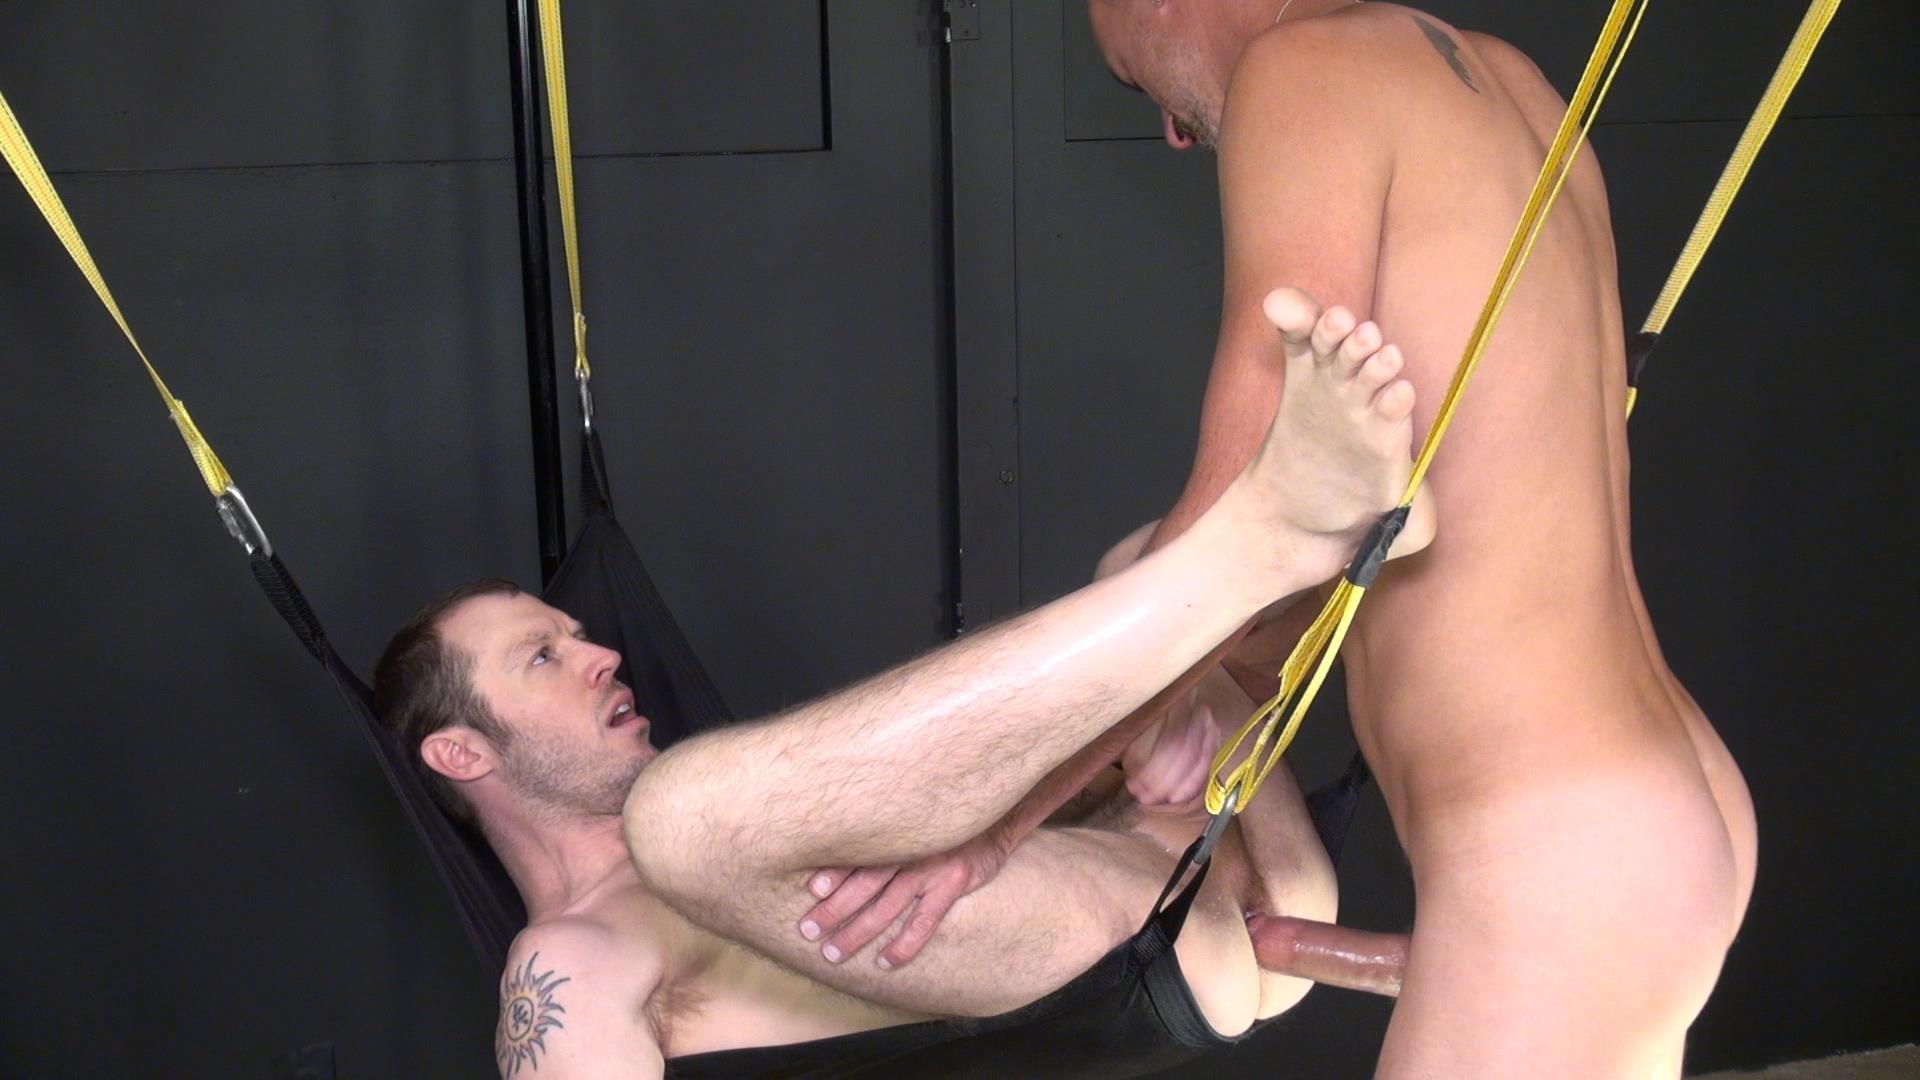 image Gay bareback his tight ass hardcore